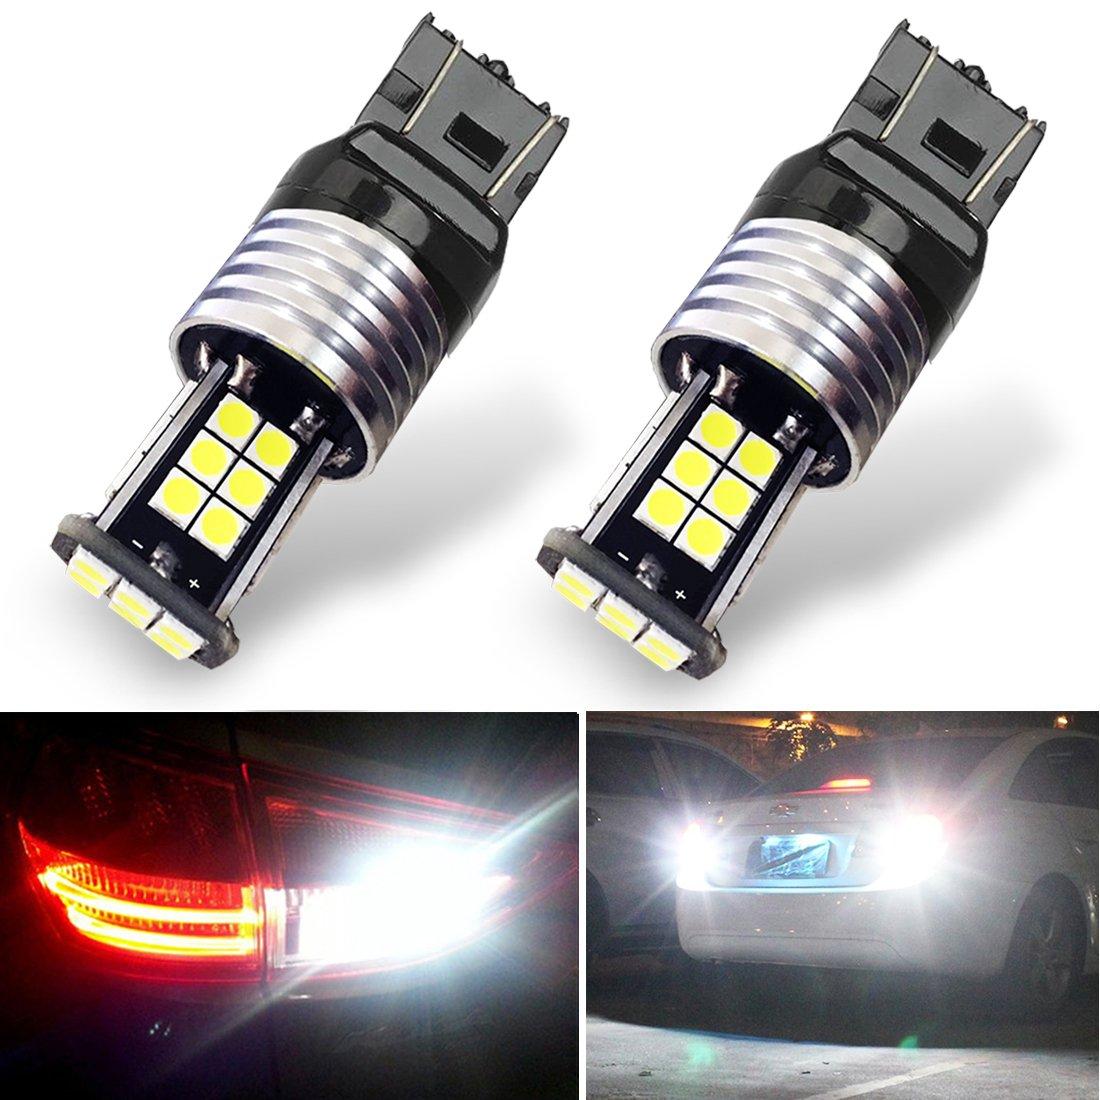 Botepon 1600 Lumens Extremely Bright 7443 7440 7441 7444 992 Led Backup Lights Bulb, 3030 24-SMD Led Bulb for Car Led Backup Reverse Lights 12V 24V (Pack of 2)